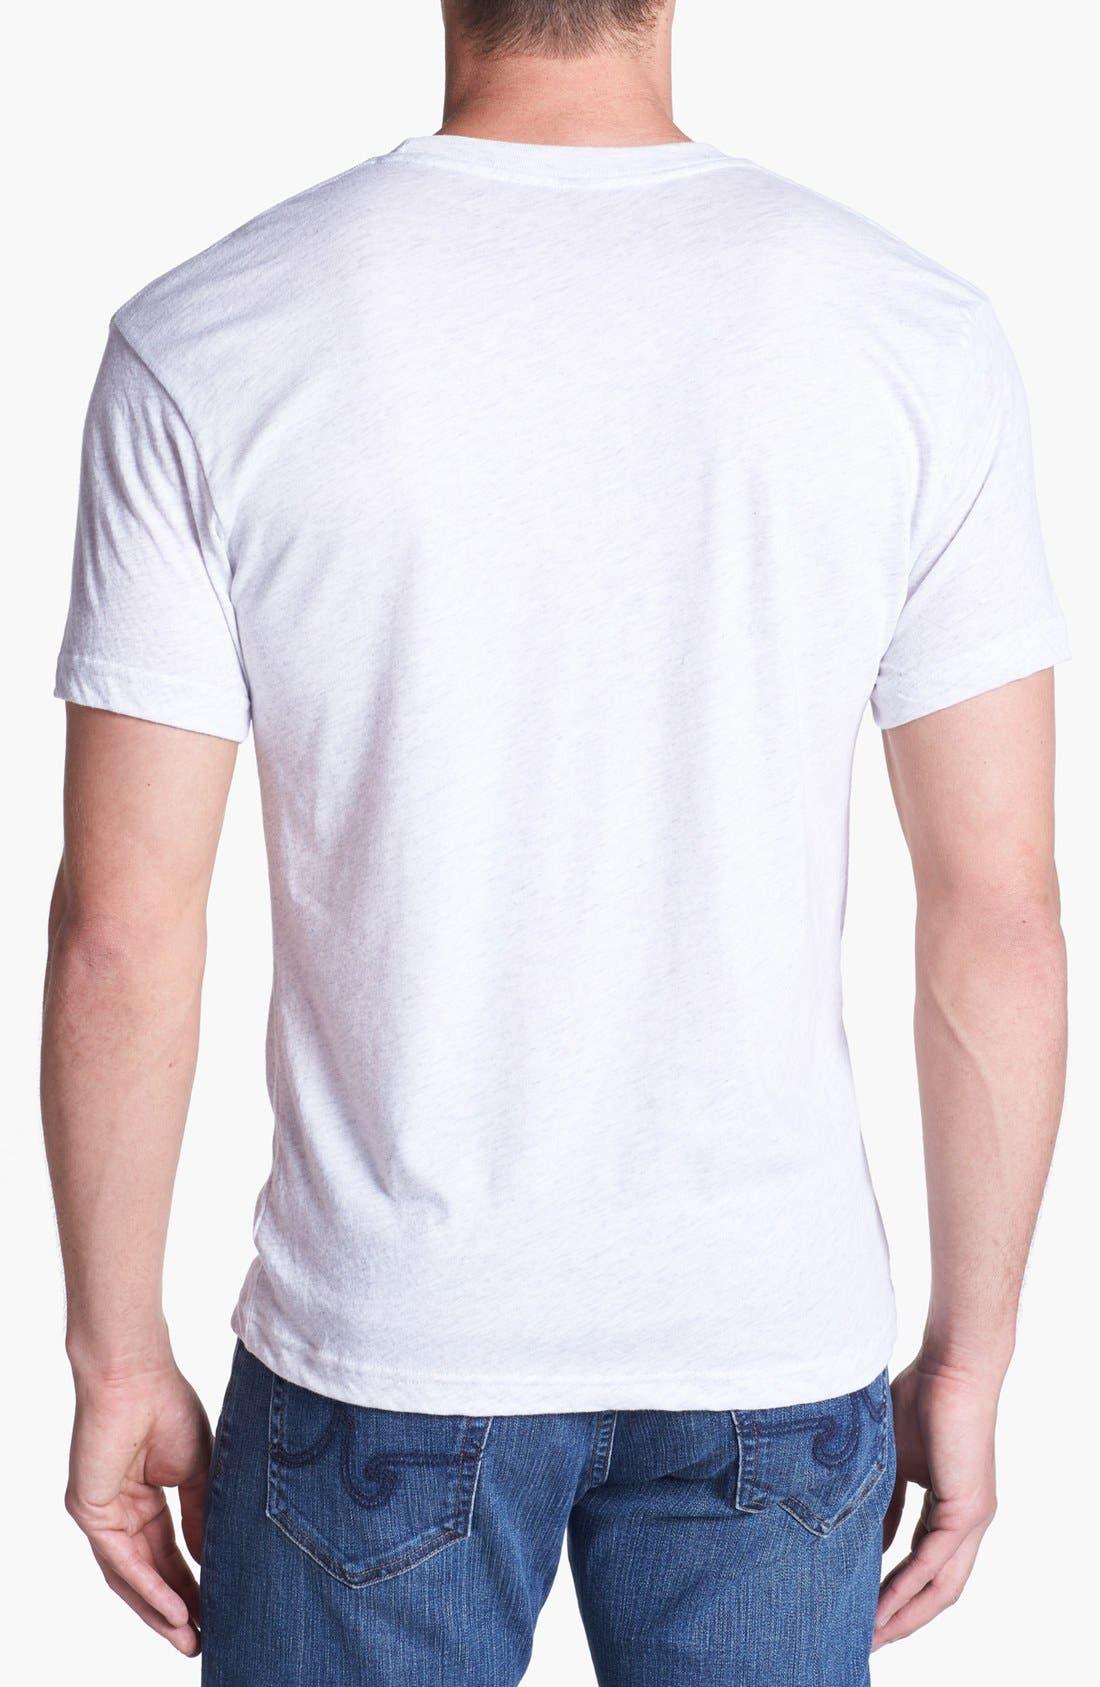 Alternate Image 2  - Bowery Supply 'South Beach' Graphic T-Shirt